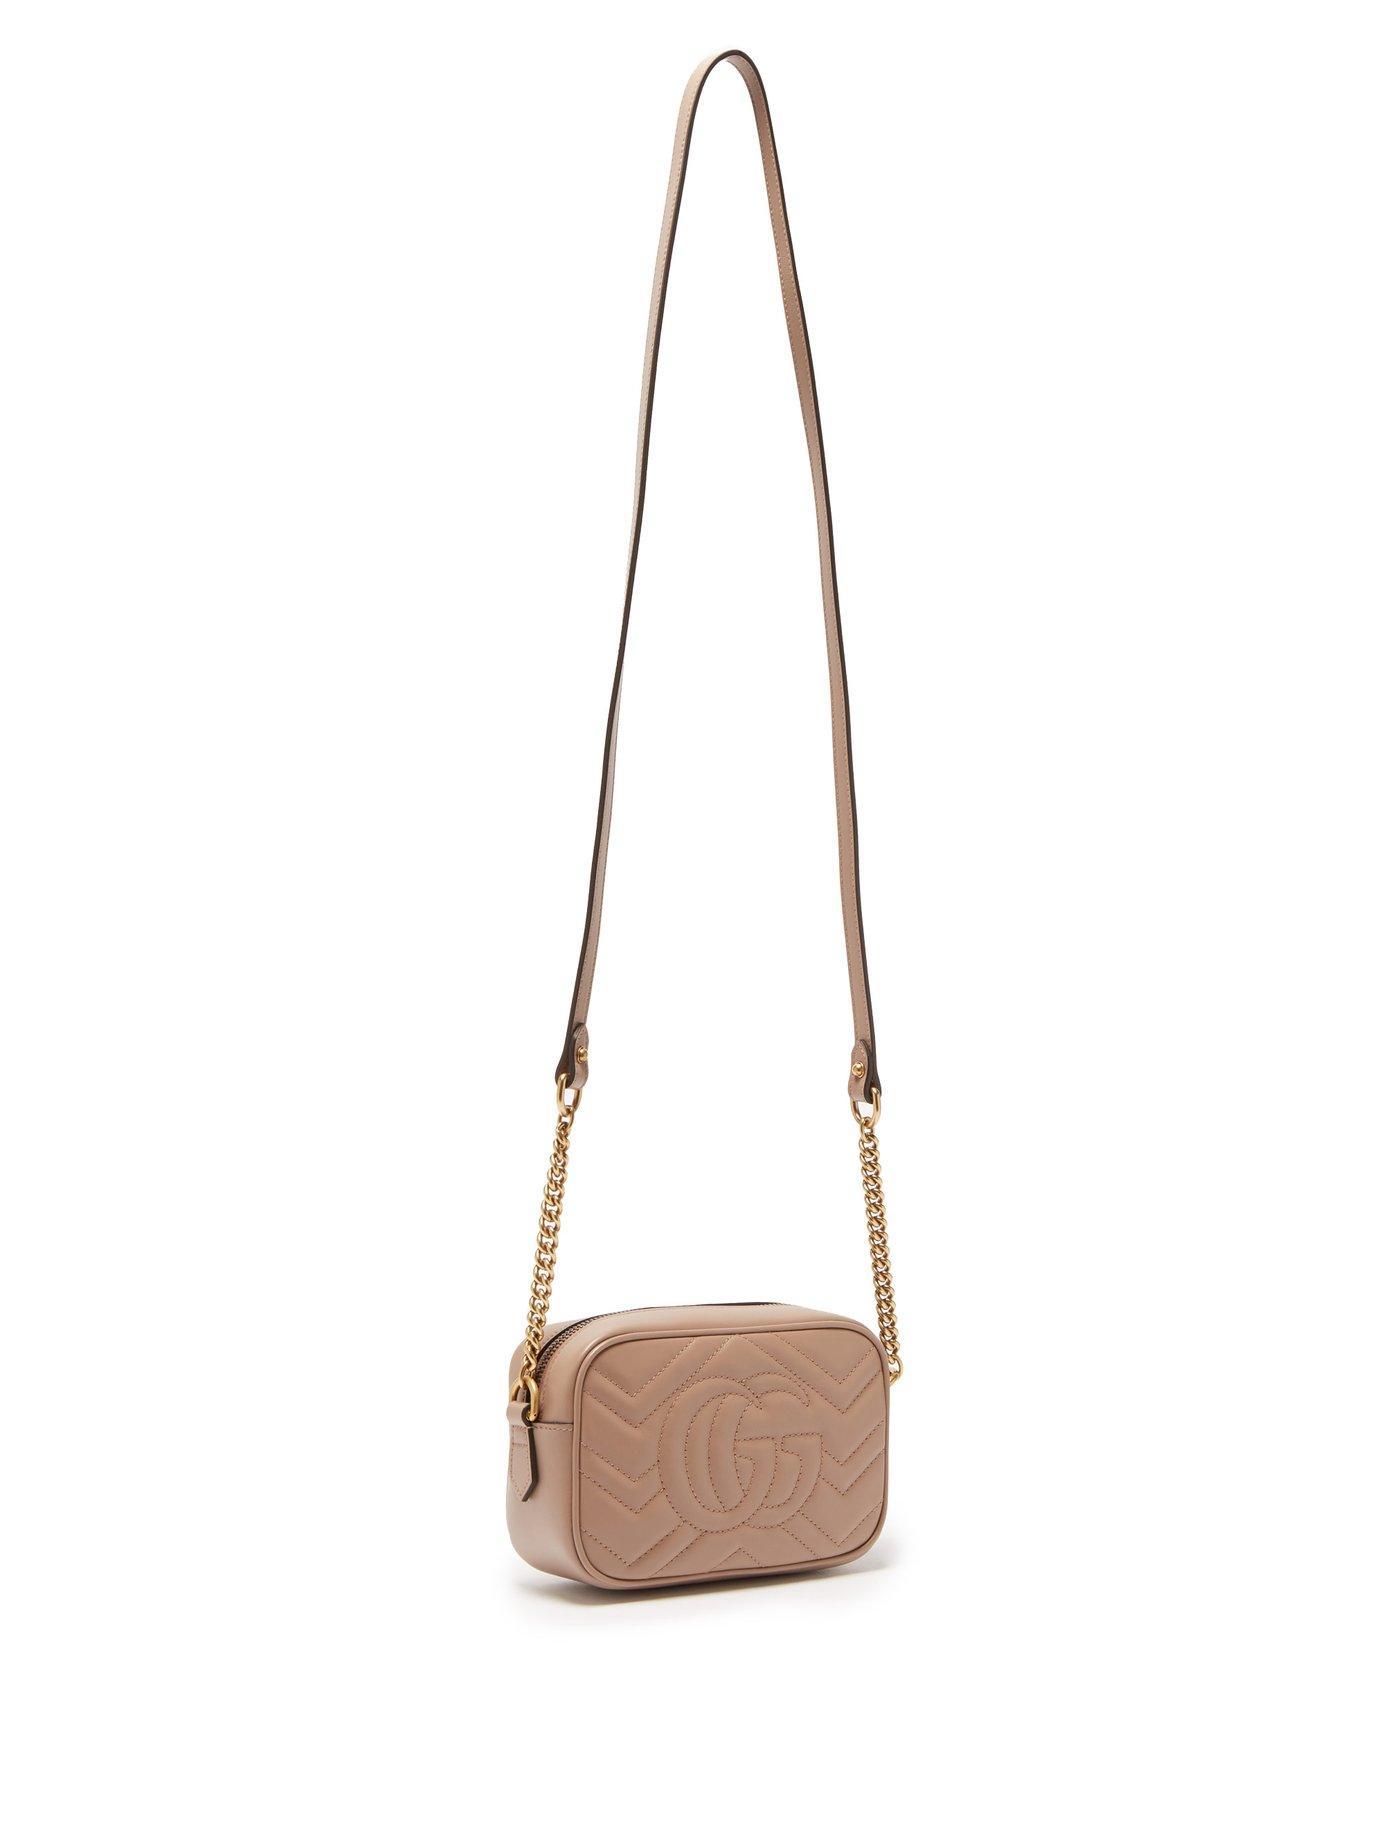 Gucci Marmont Gg Mini Round Leather 550154 Black Cross